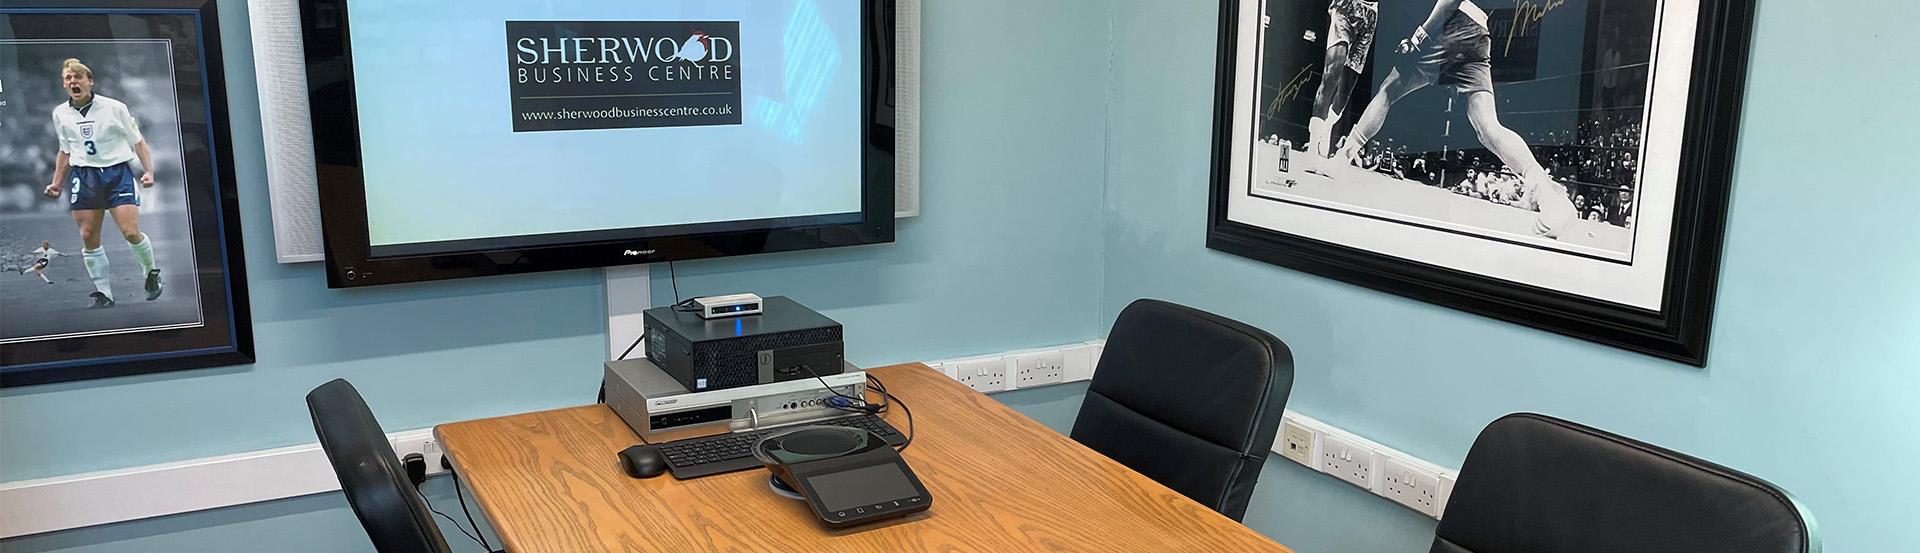 Sherwood Business Centre Boardroom